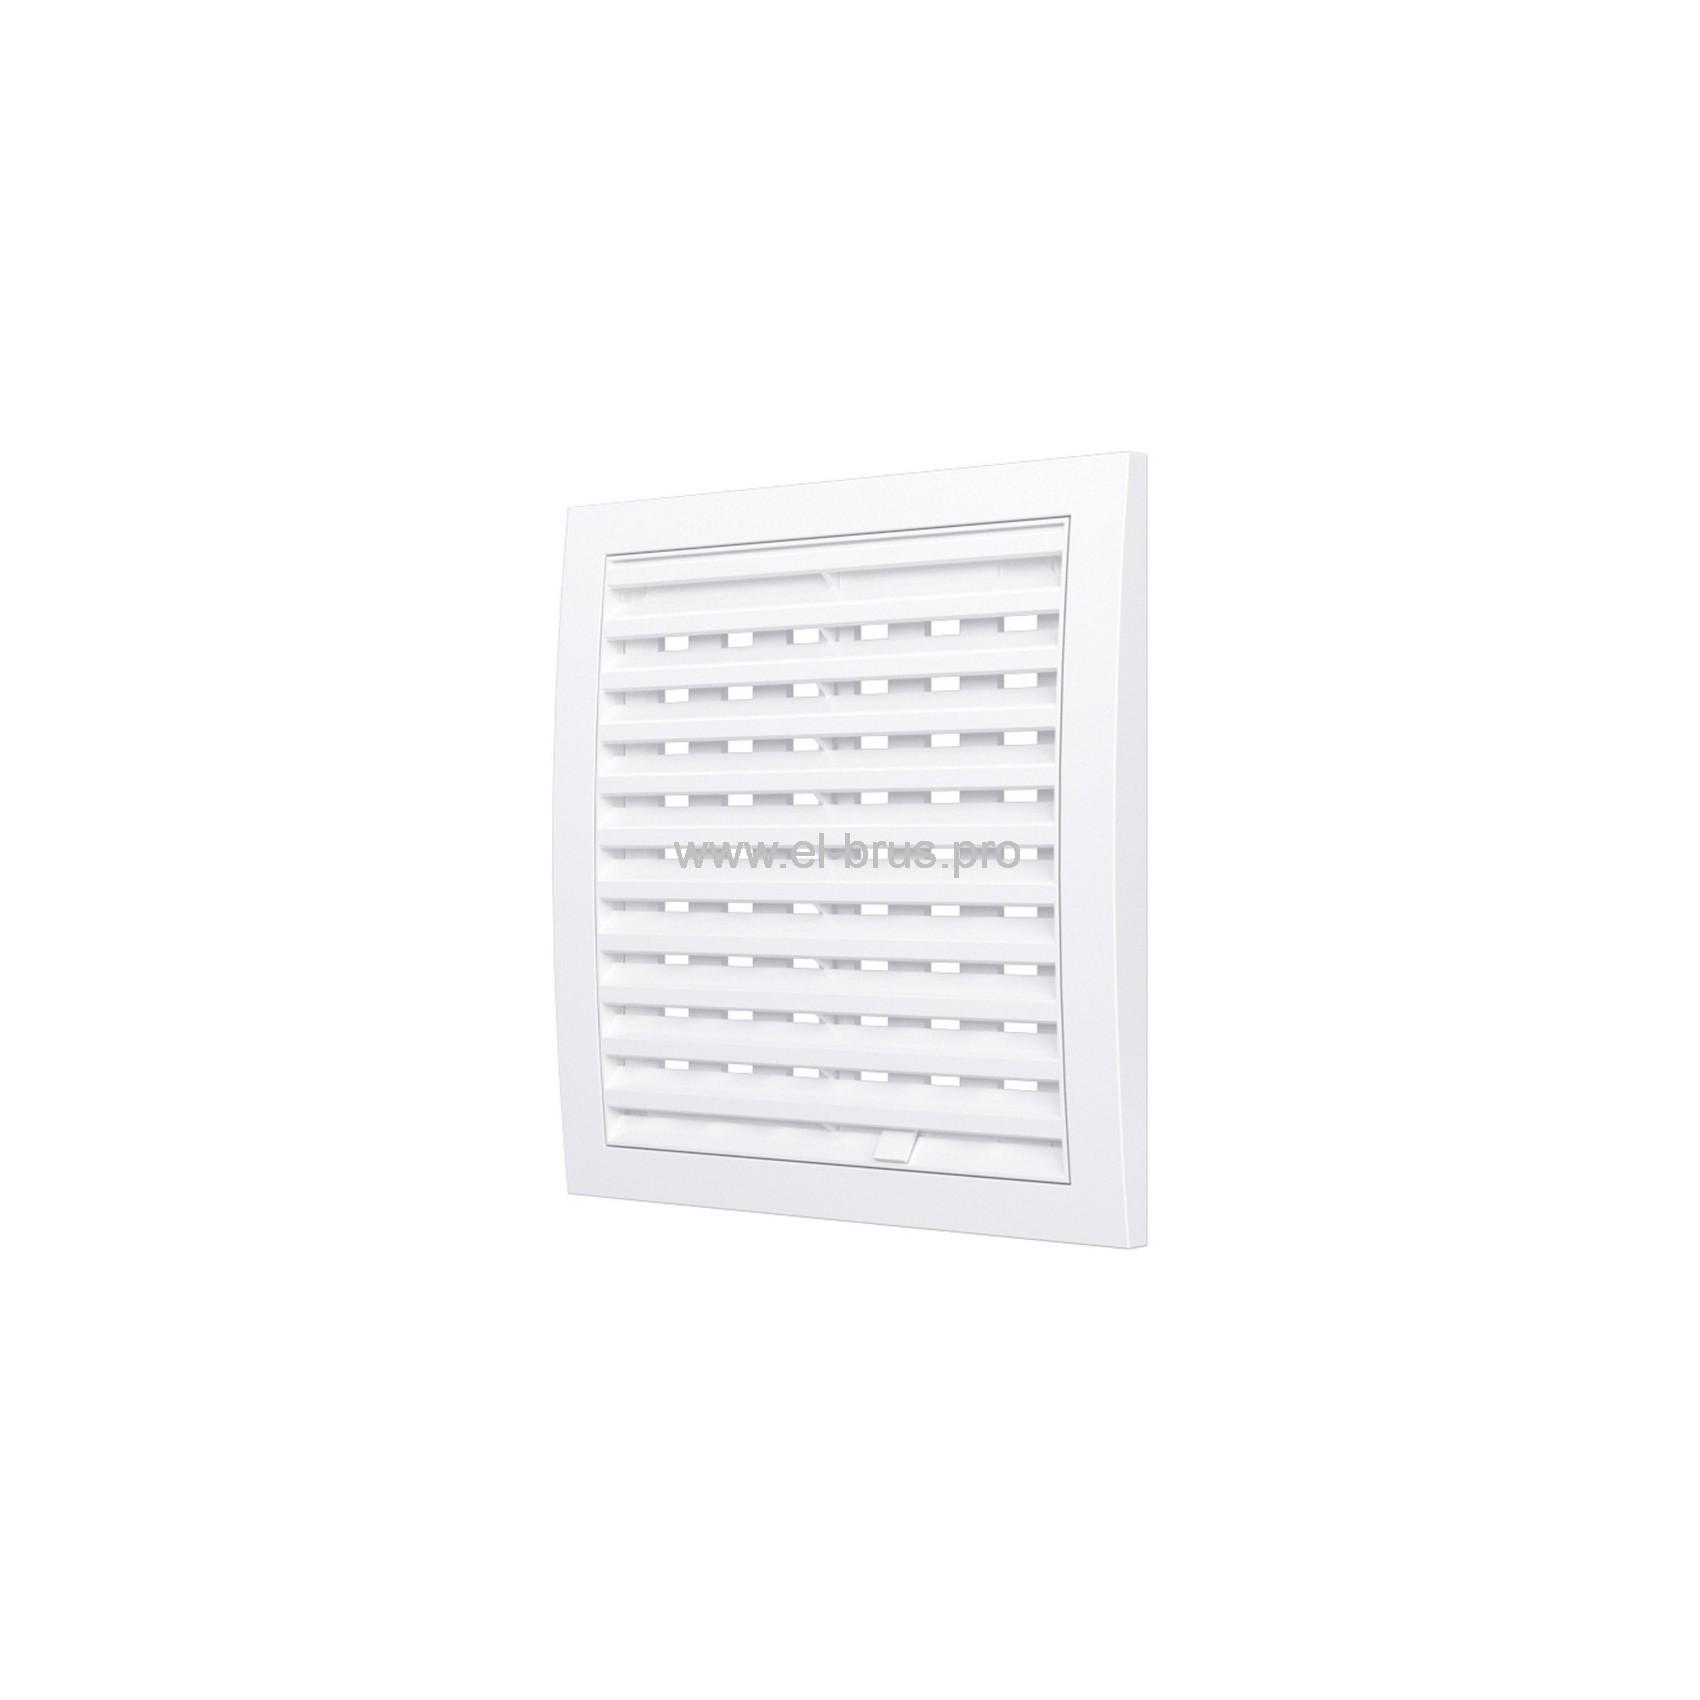 Решетка вент. разъемная регулир. 150х150мм белая ERA 1515РРП